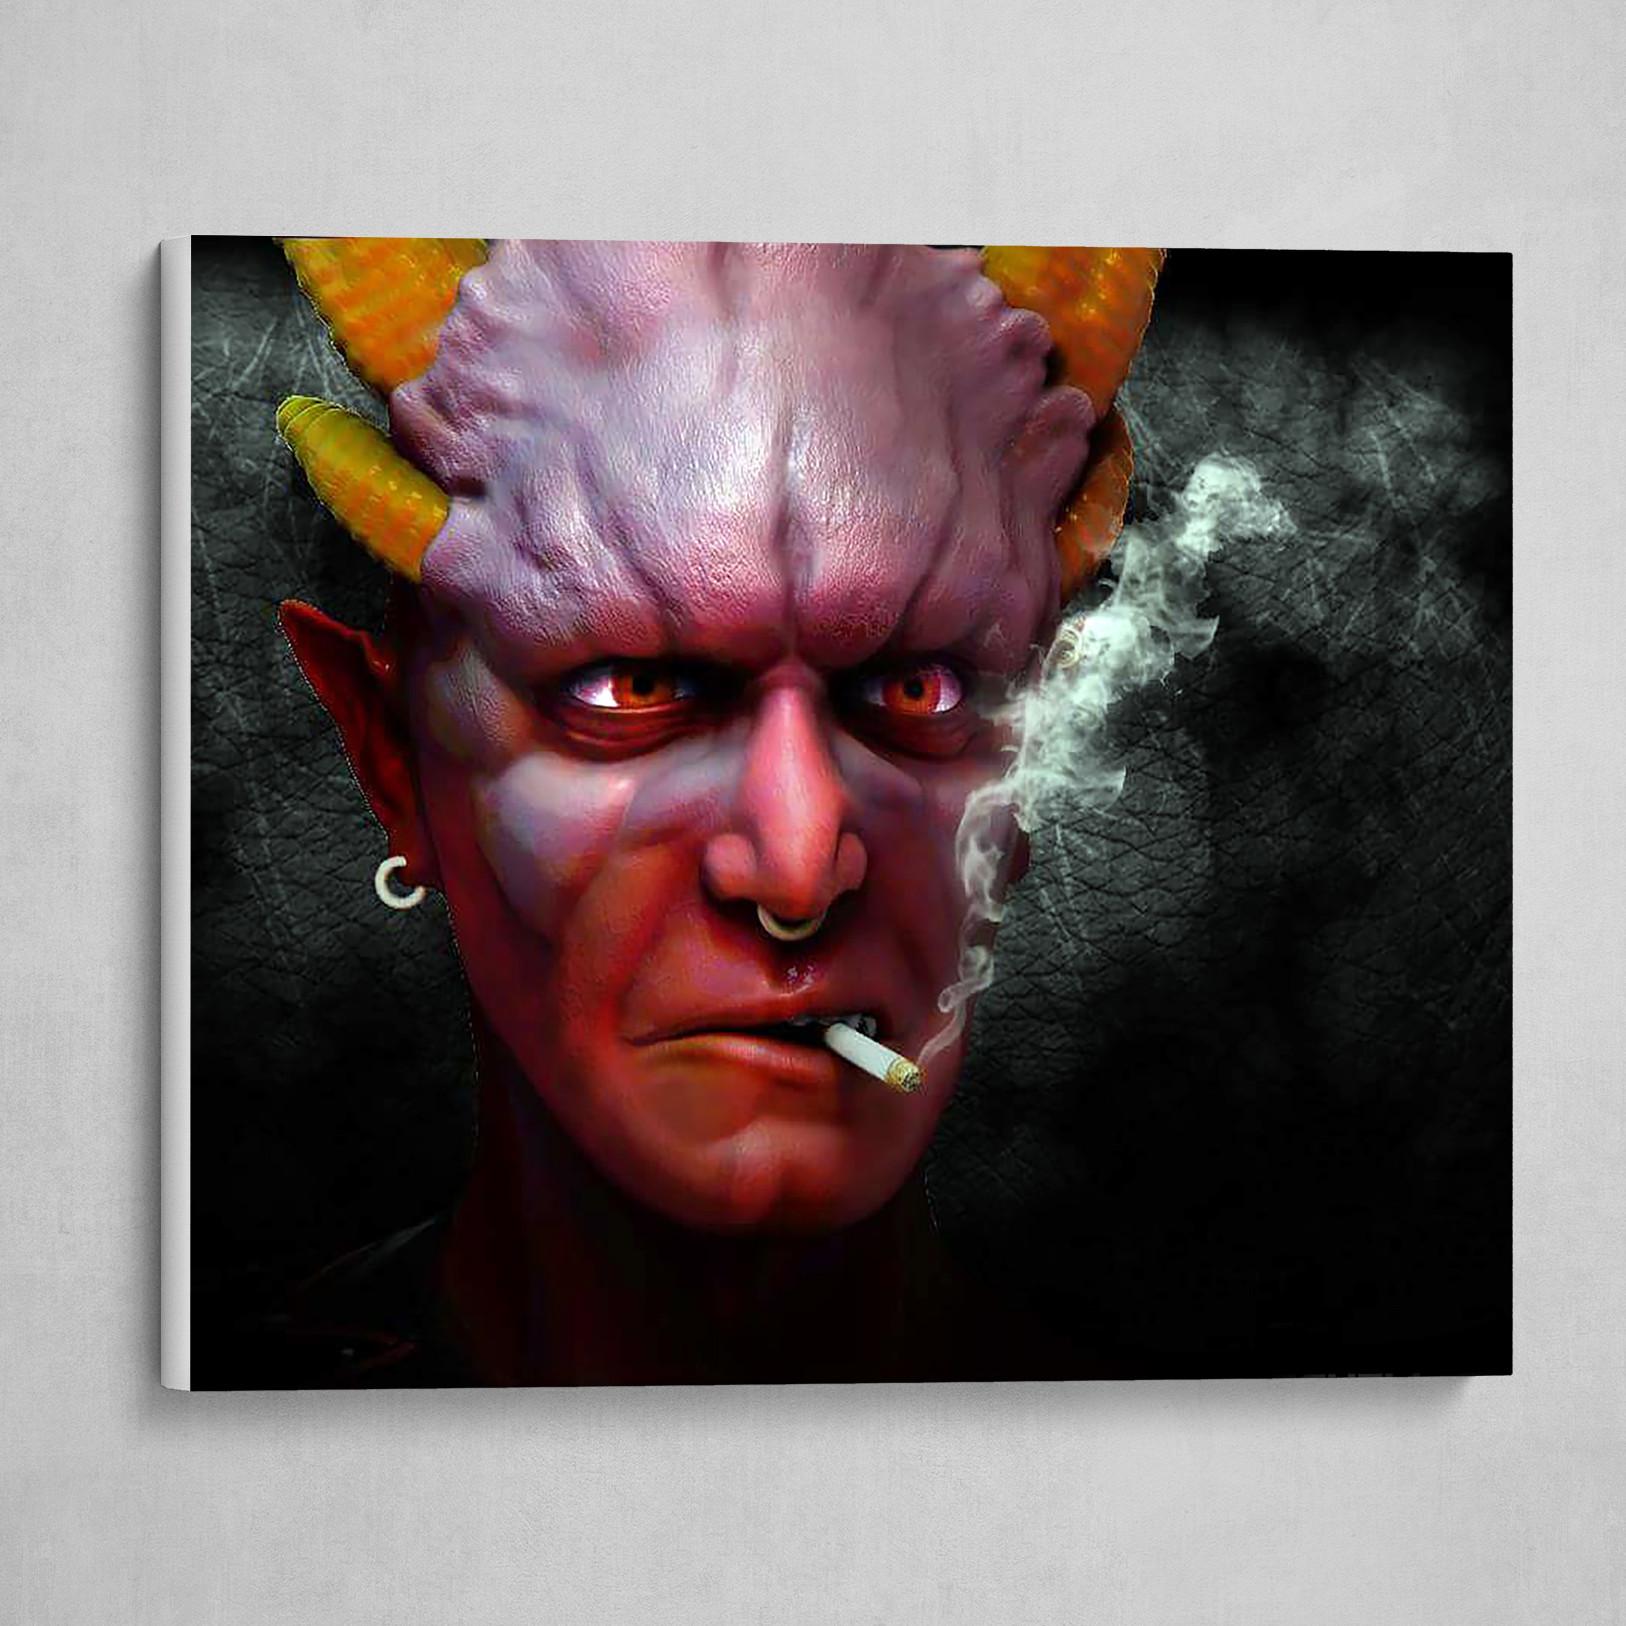 Dar'trax, the Demon Punk